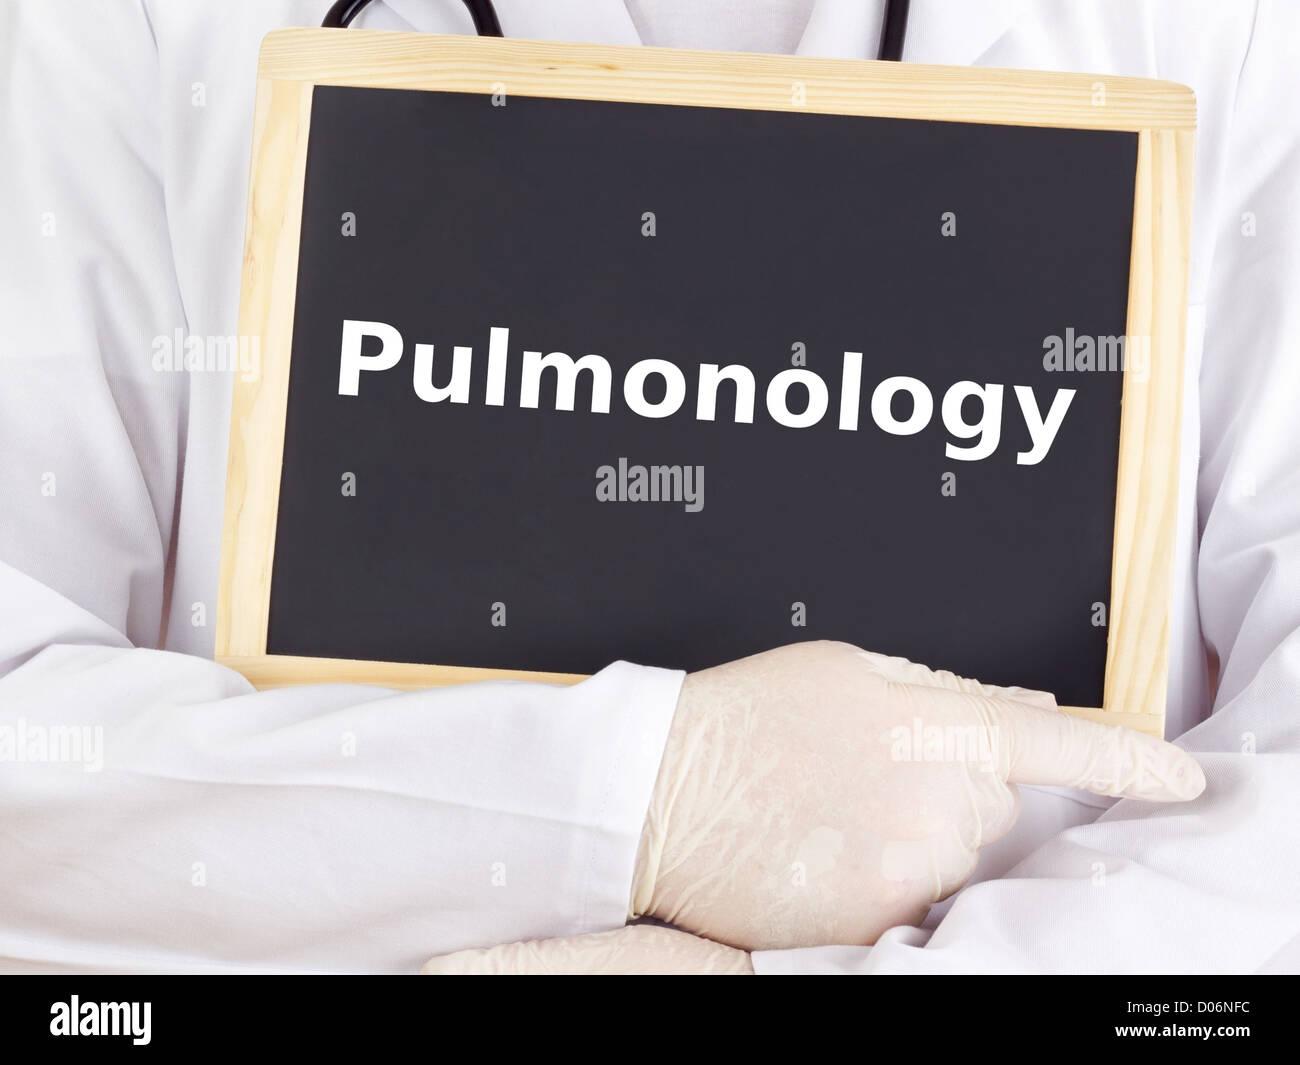 Doctor shows information on blackboard: pulmonology - Stock Image